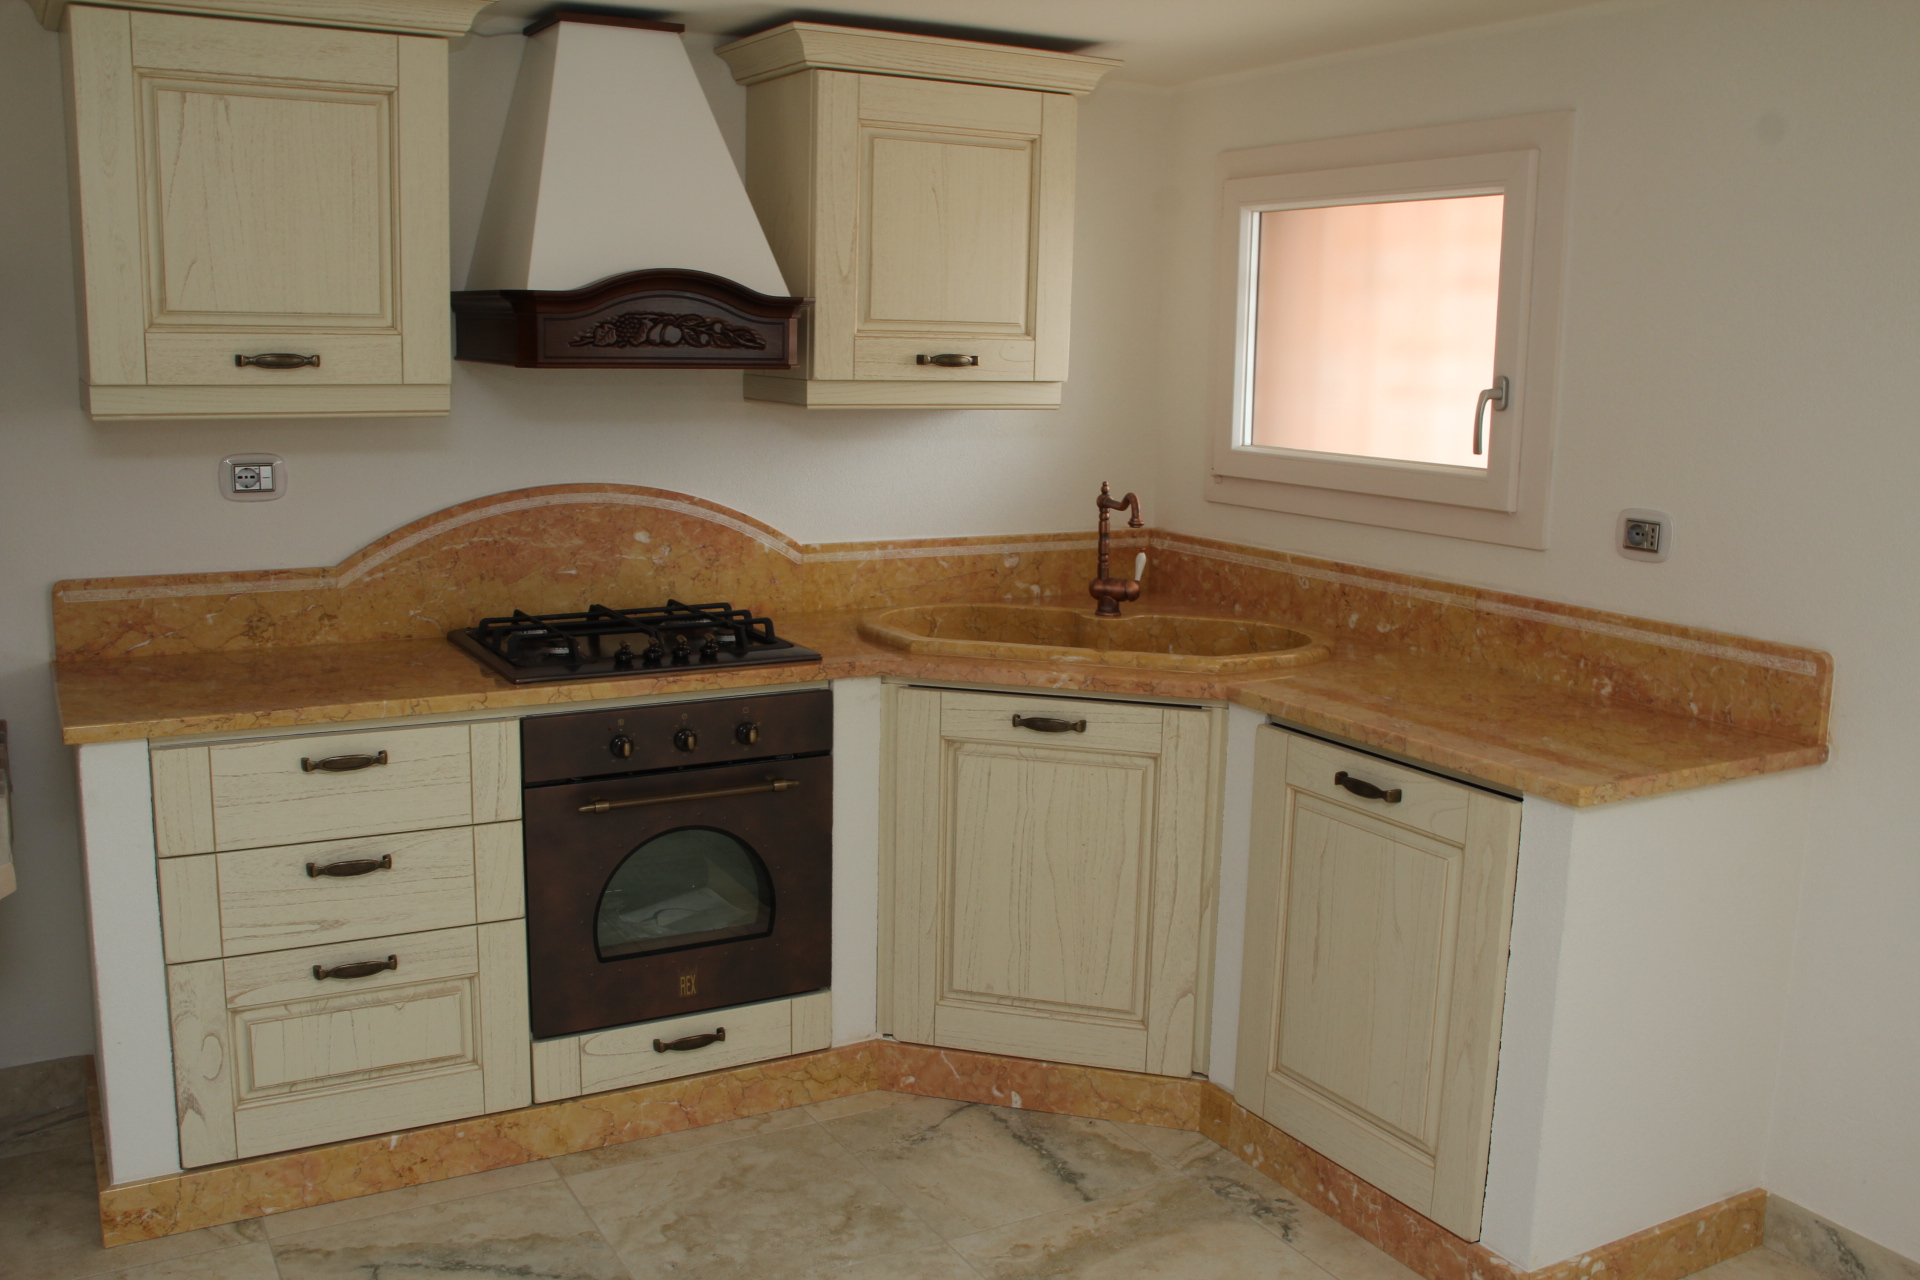 Foto piani di cucina in marmo e pietra vendute a prezzi affare for Cucine foto